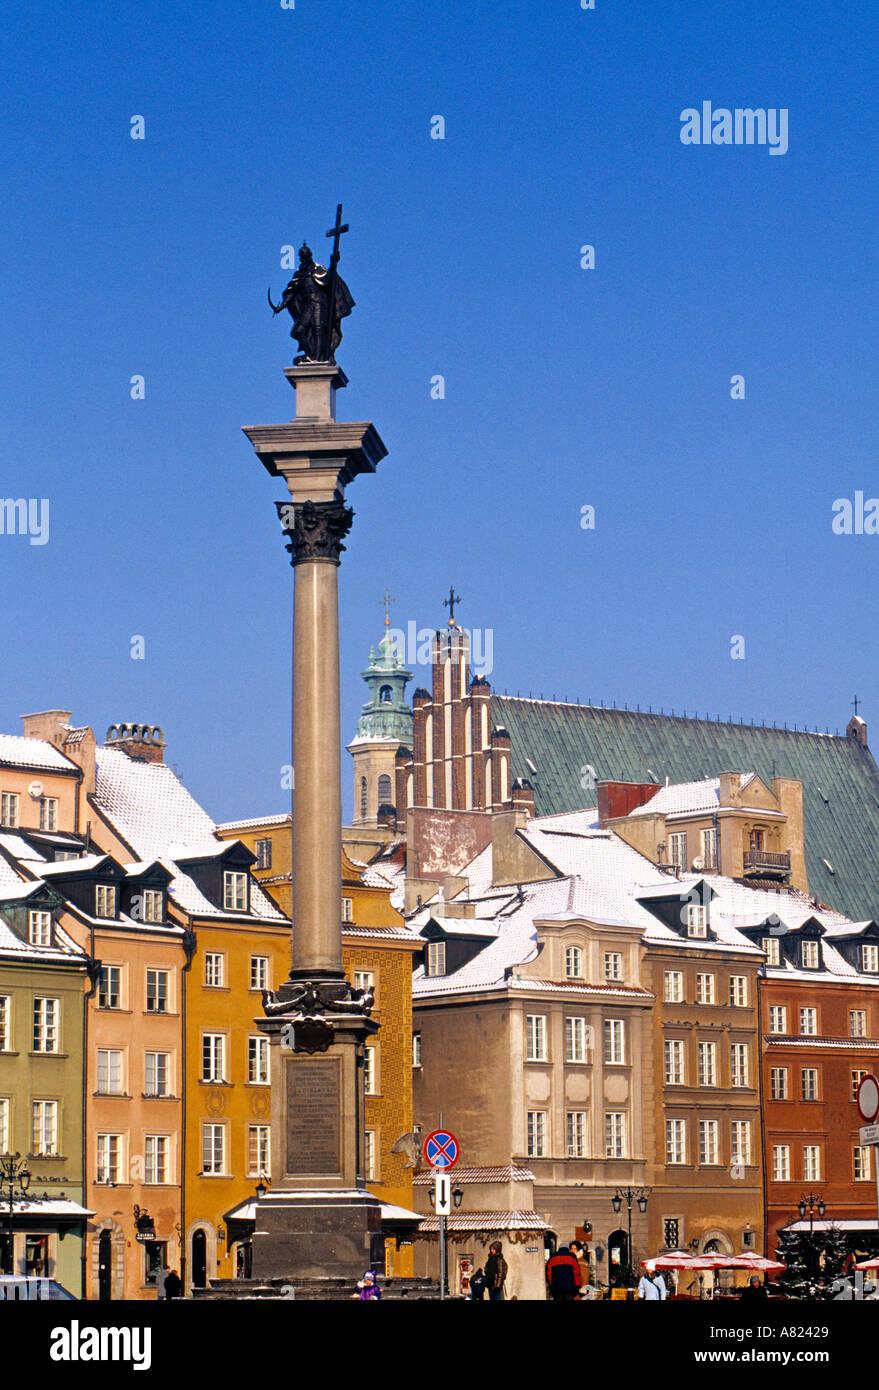 Castle Square (Zamkowy pl), Warsaw, Poland - Stock Image